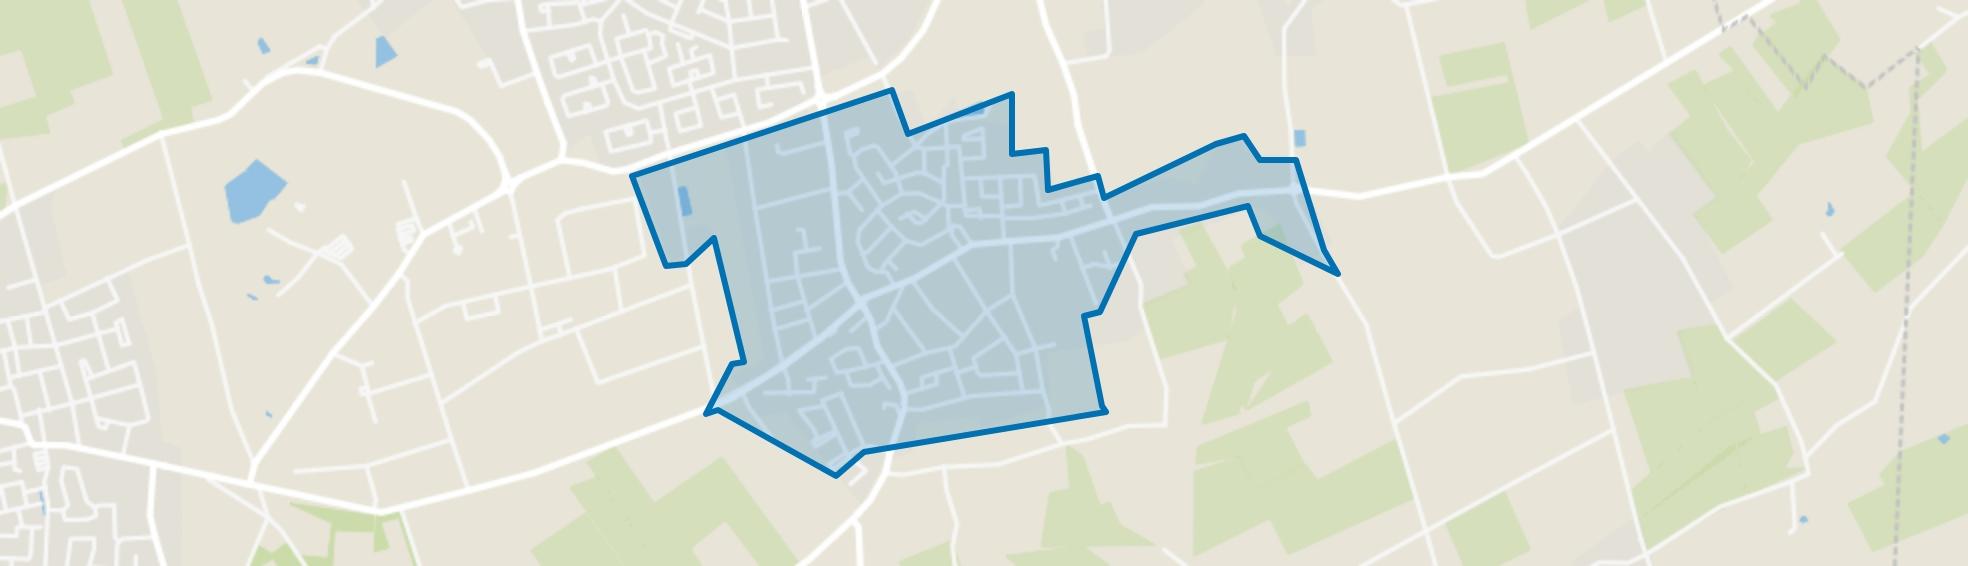 Sprundel, Sprundel map